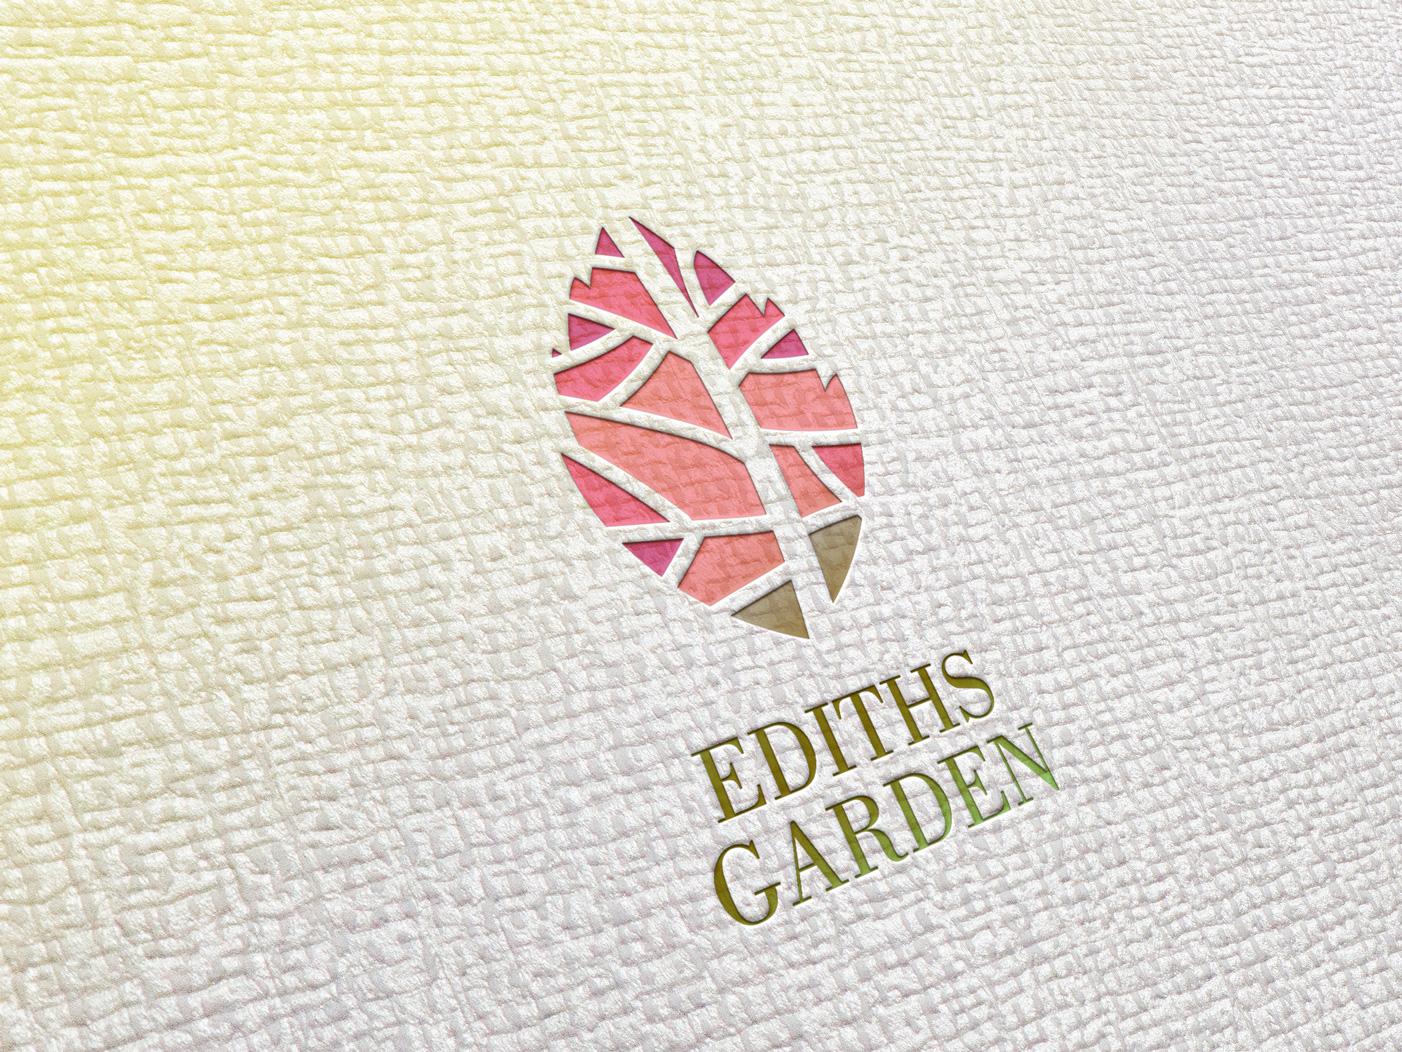 Ediths-Garden-Logo-mockup